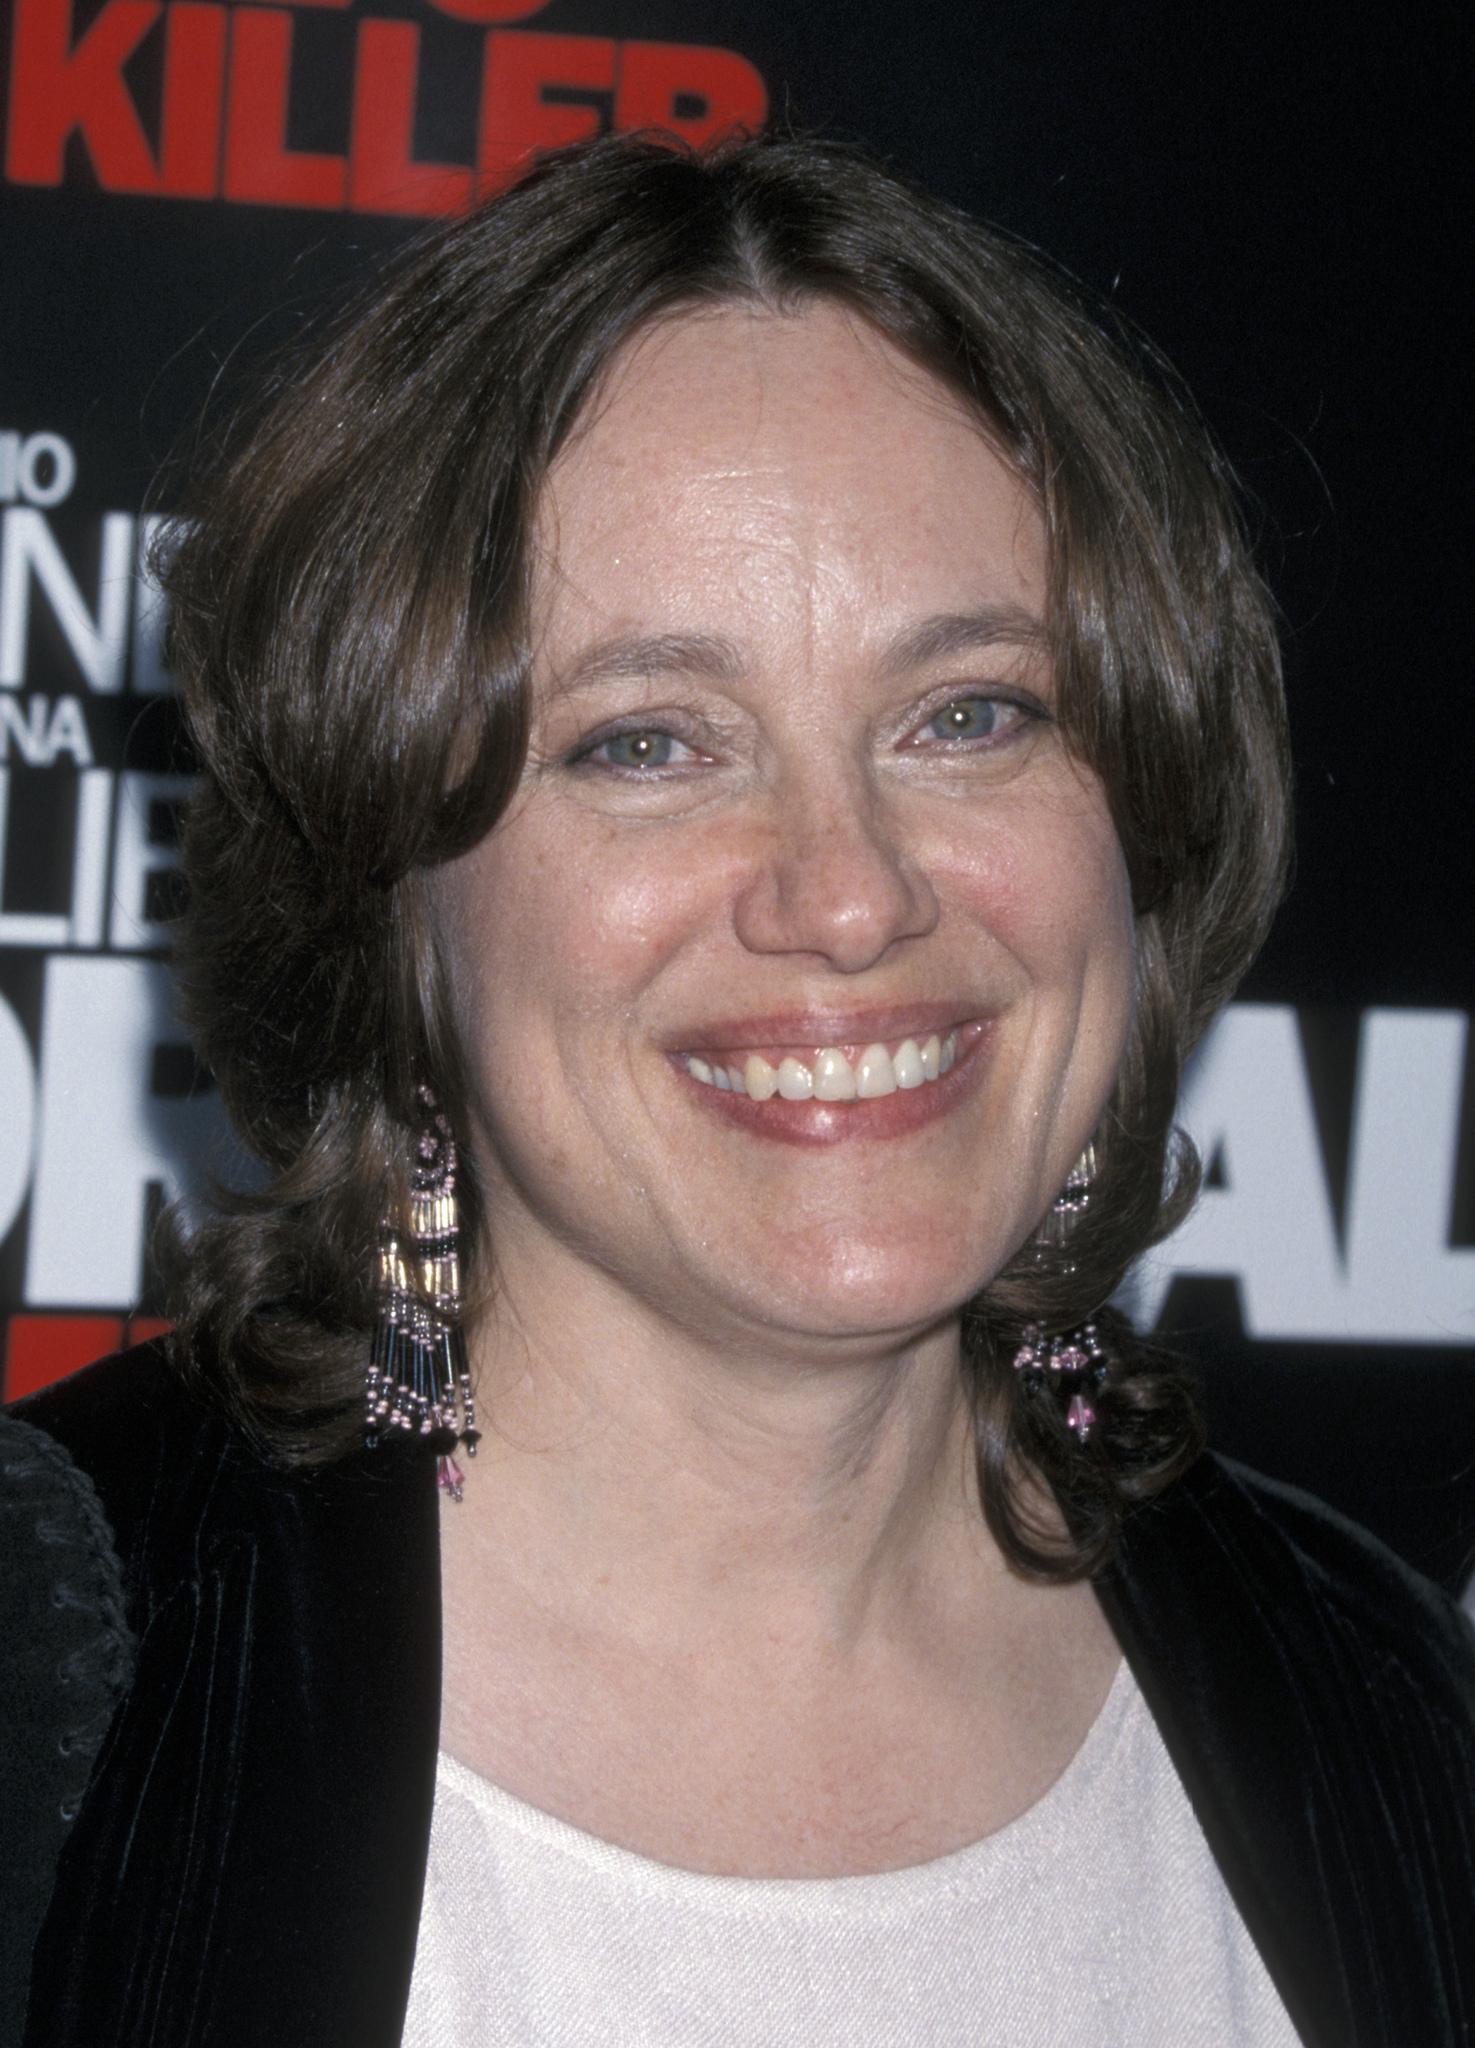 Marcheline Bertrand